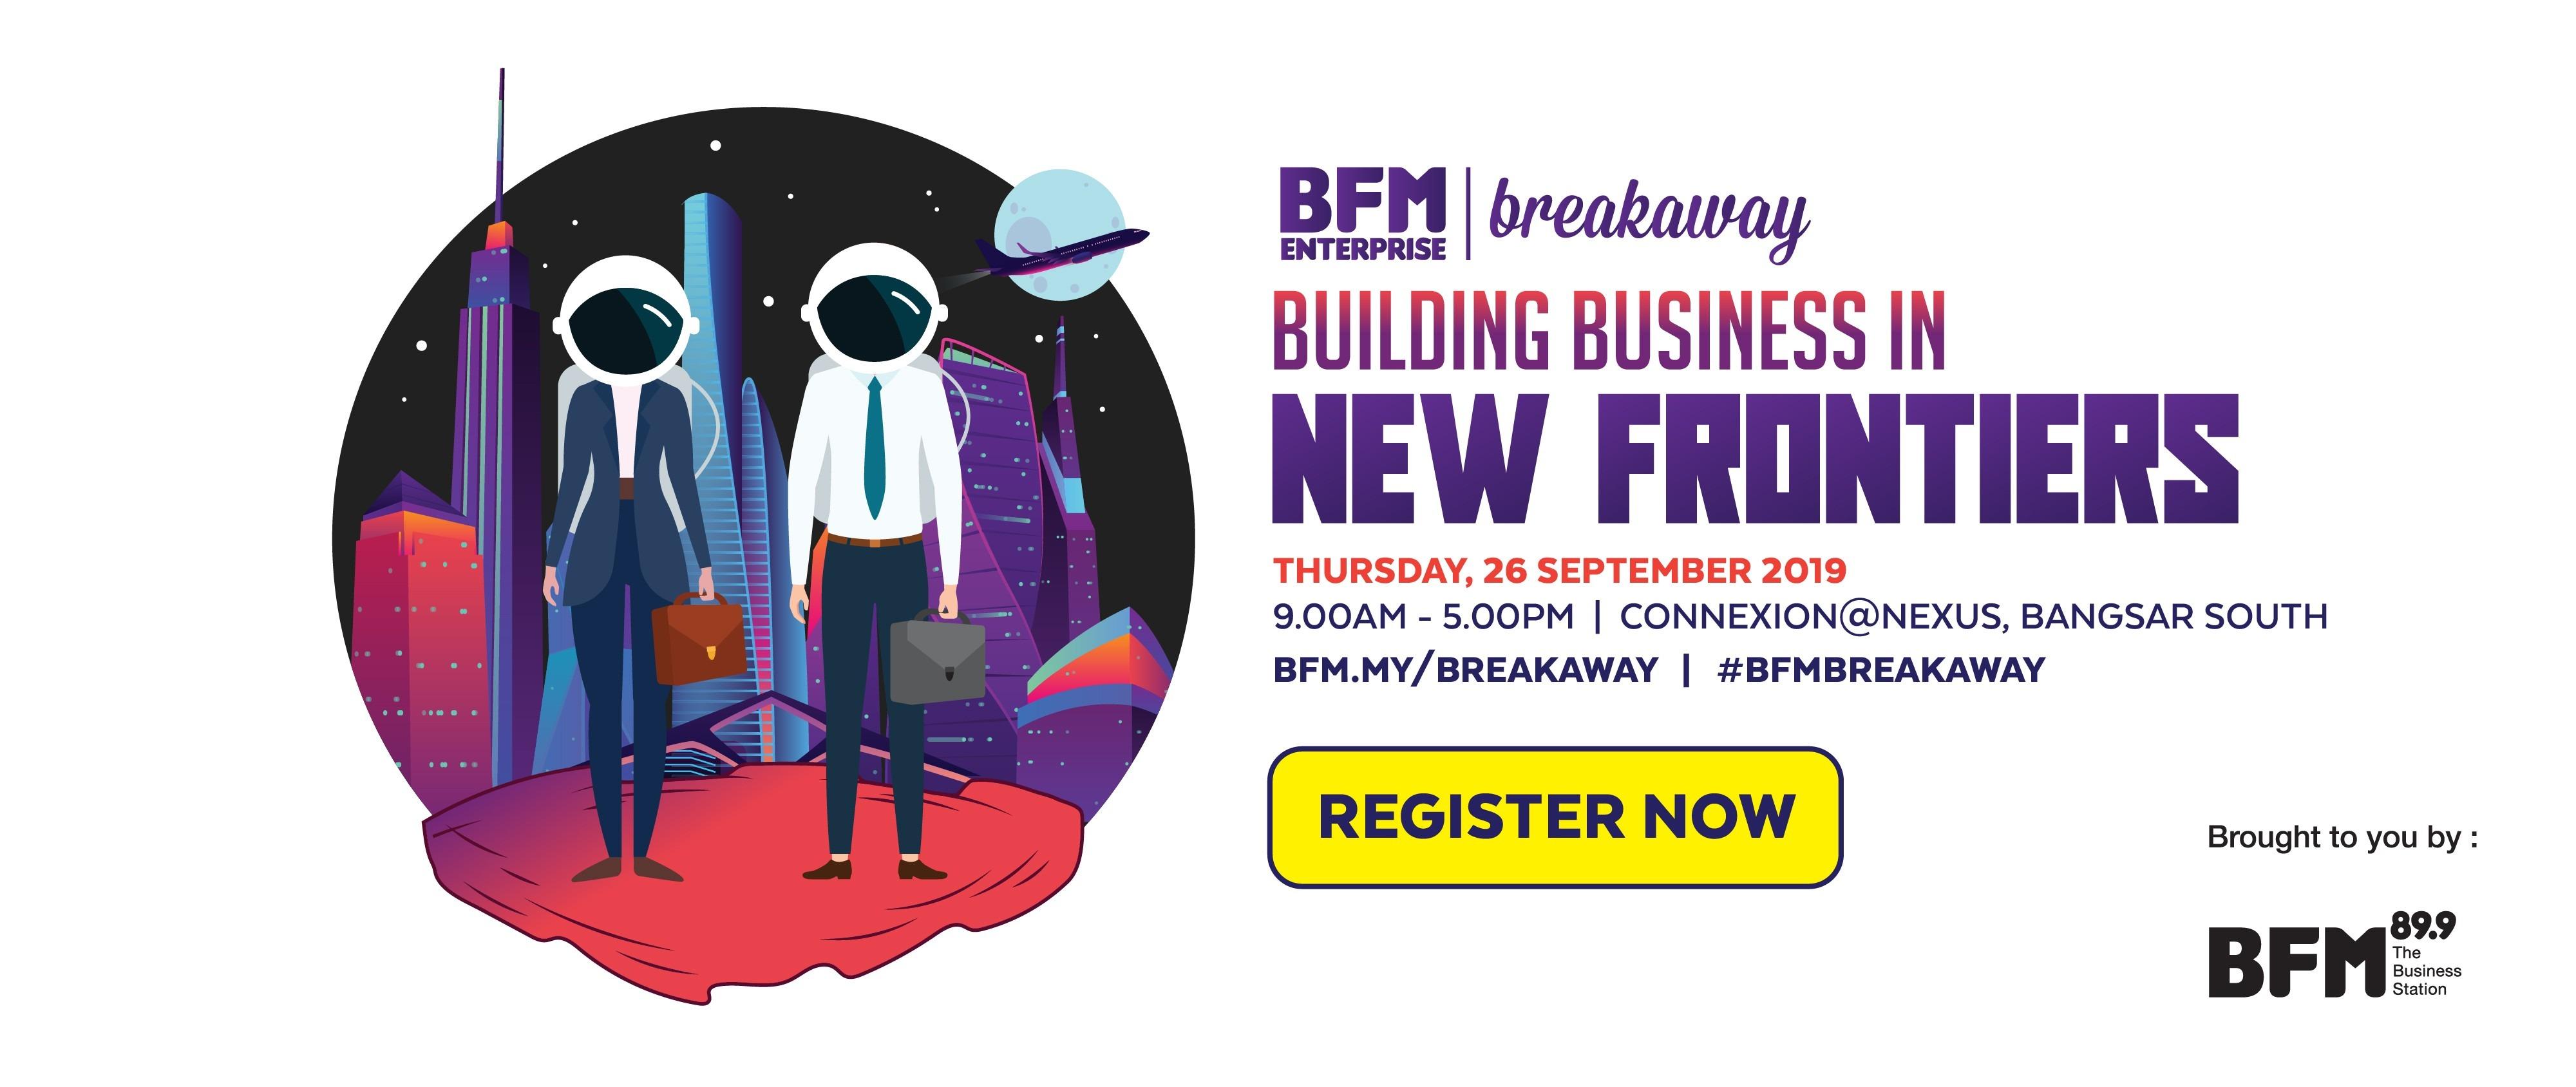 BFM Enterprise Breakaway 2019